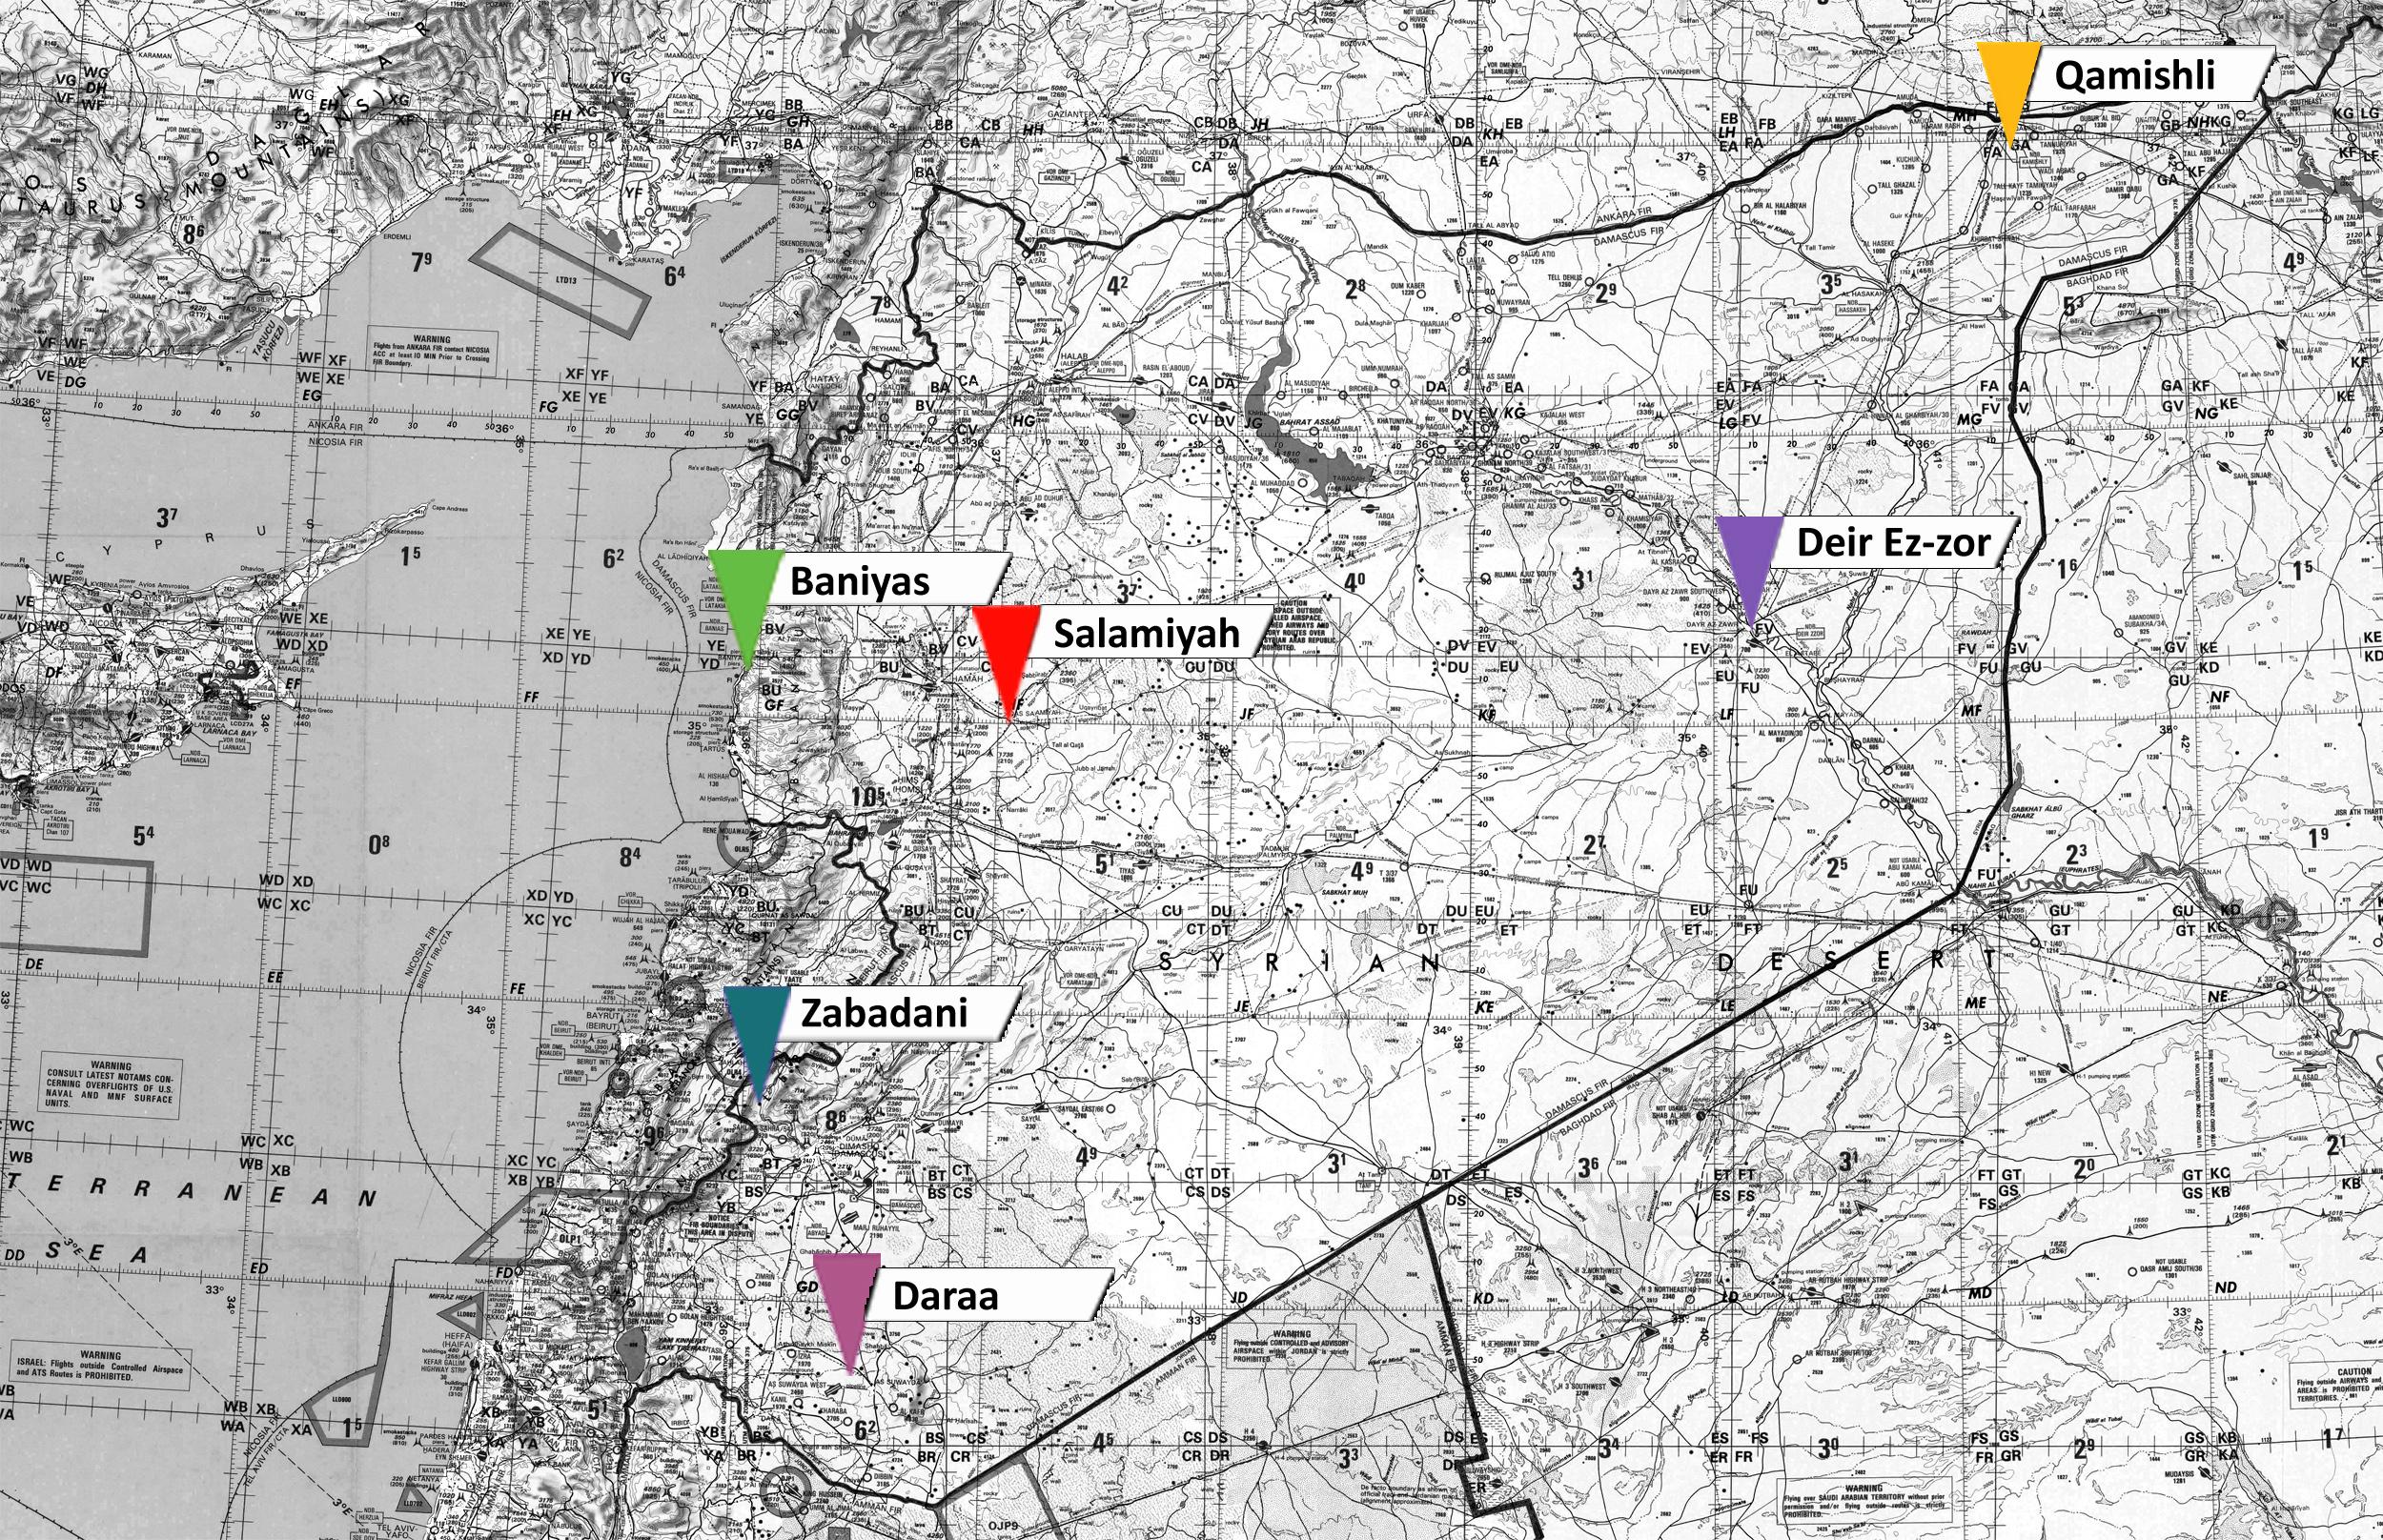 Cities In Revolution SyriaUntold حكاية ما انحكت - Qamishli map